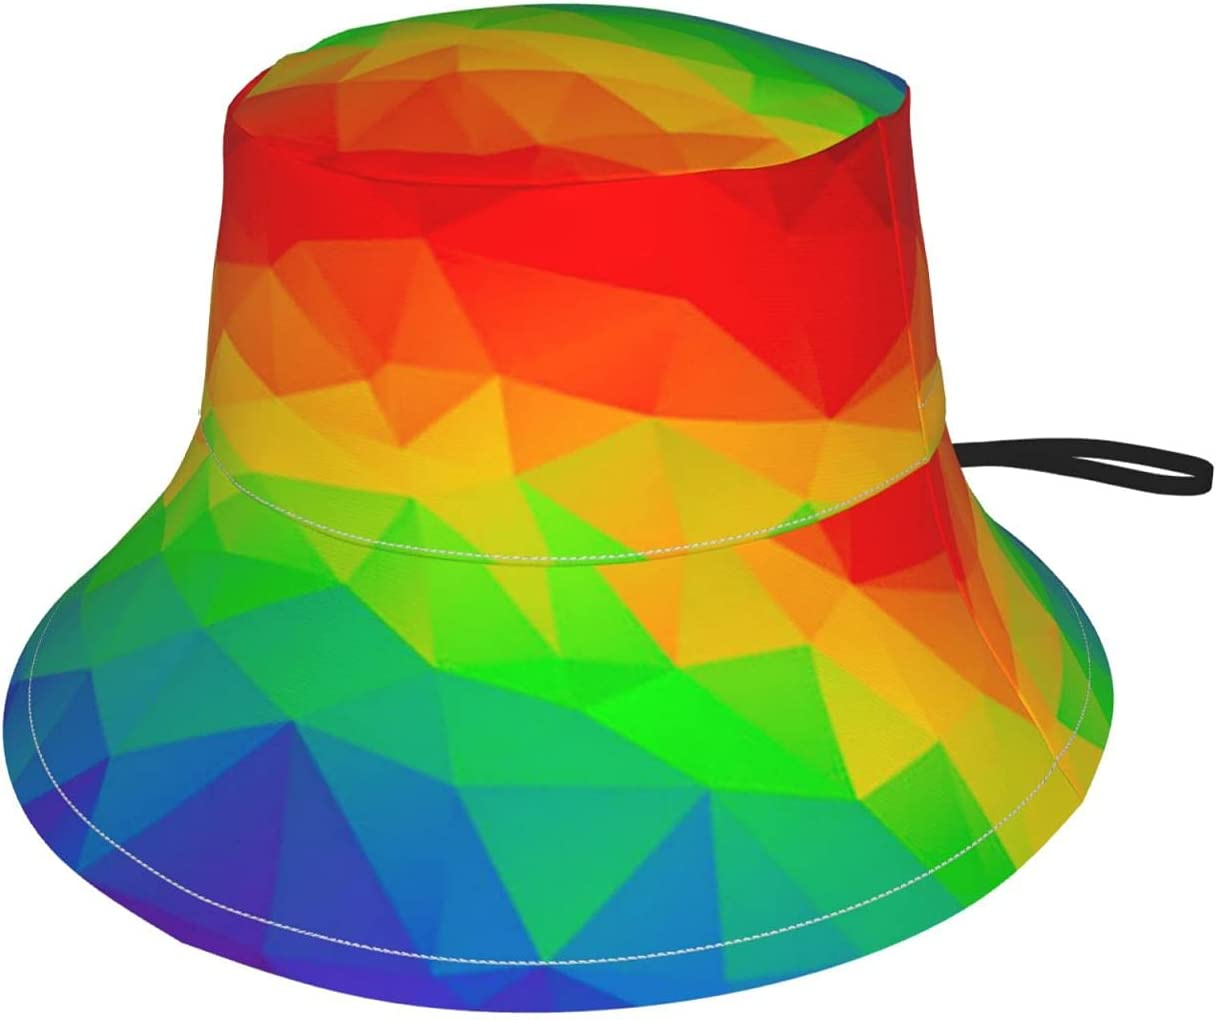 Polygonal Geometric Rainbow Colorful1 Adjustable Kids Sun Hat Summer Beach Bucket Hat Boys Girls Fishing Hats Small